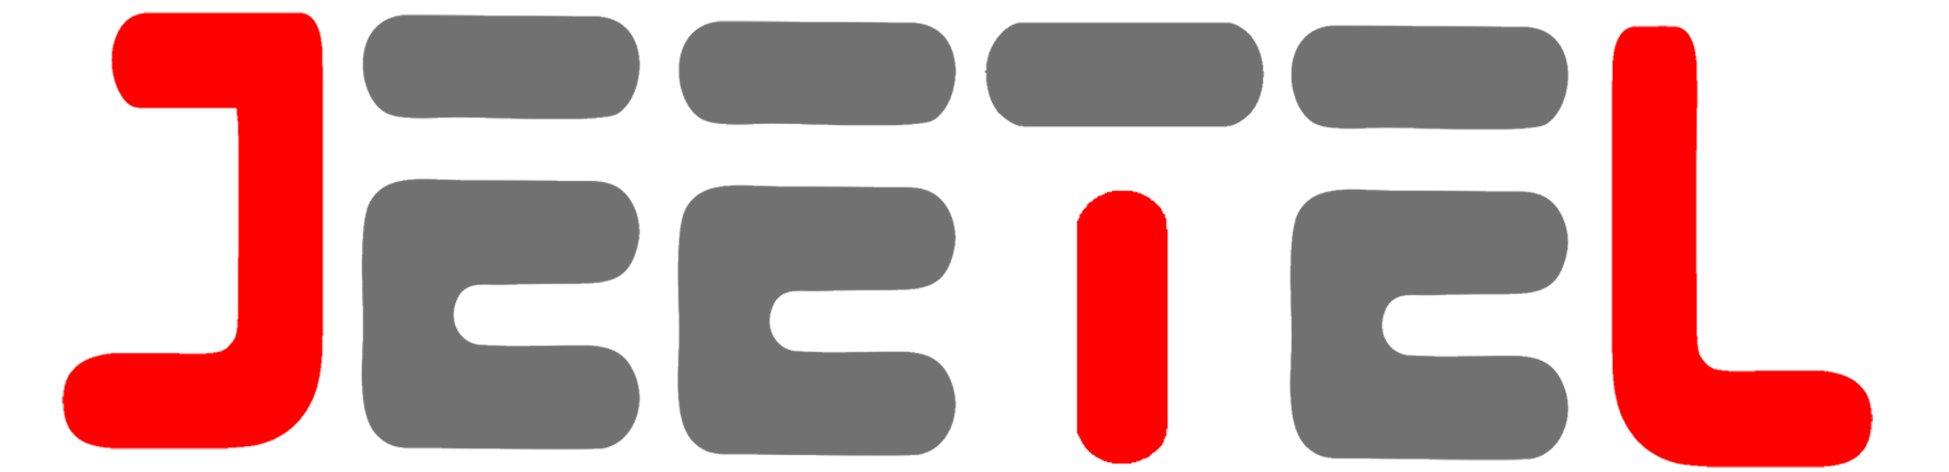 جیتل | فروشگاه آنلاین لوازم جانبی موبایل